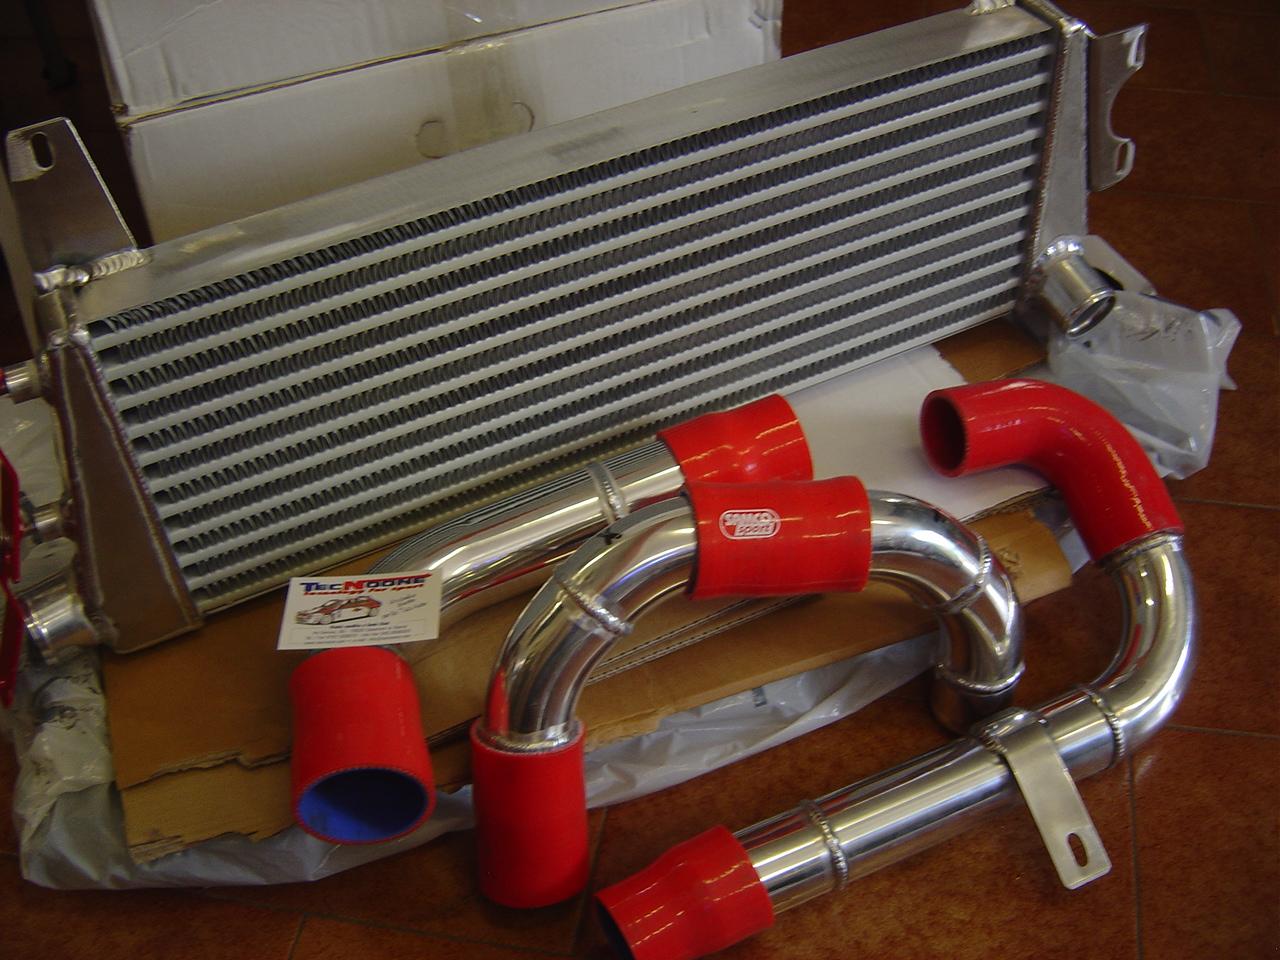 Eshop Intercooler 500 Abarth Max Litraggio